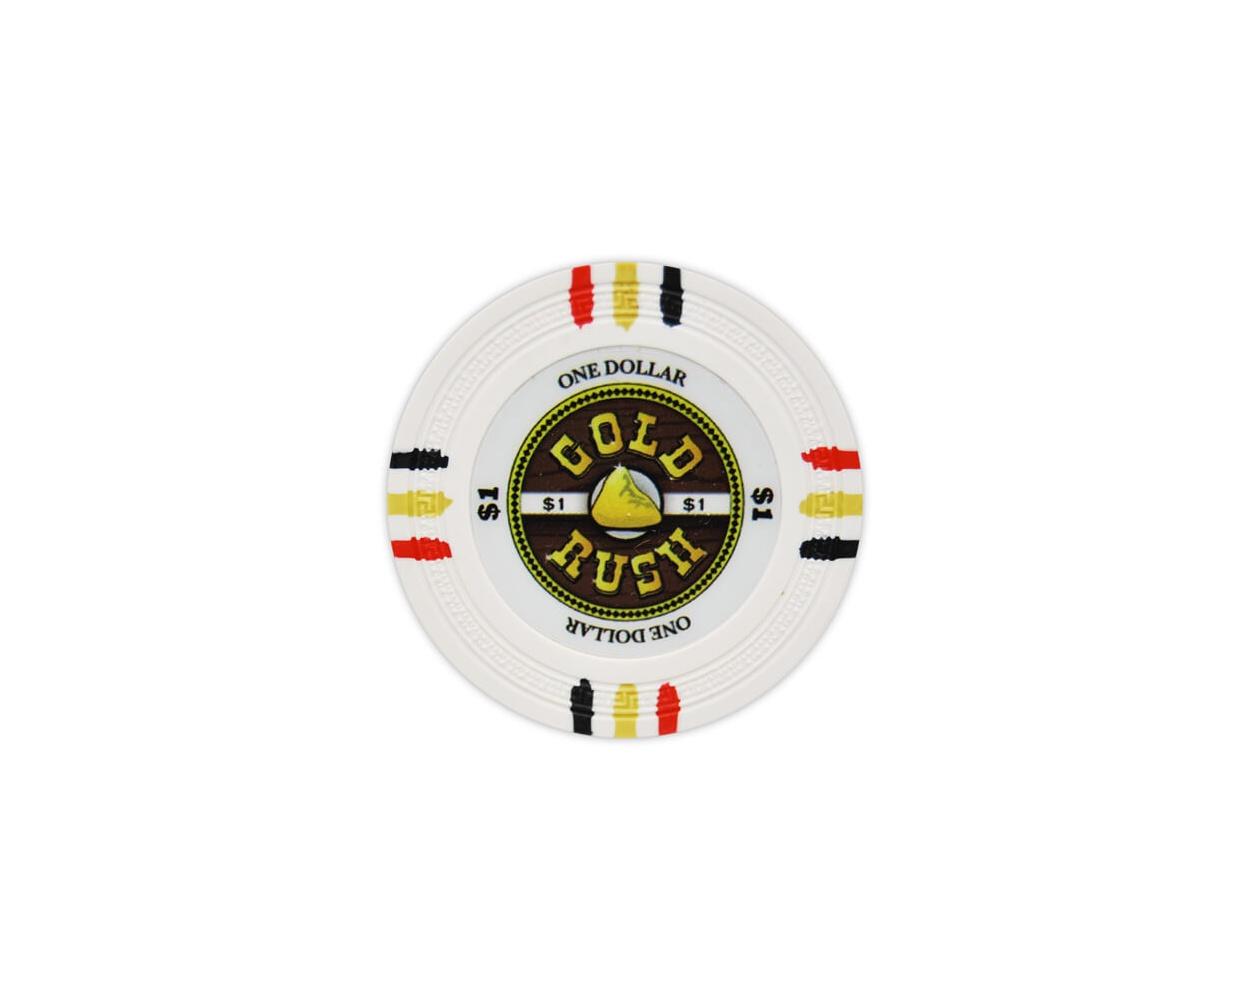 Gold Rush - $1 White Clay Poker Chips